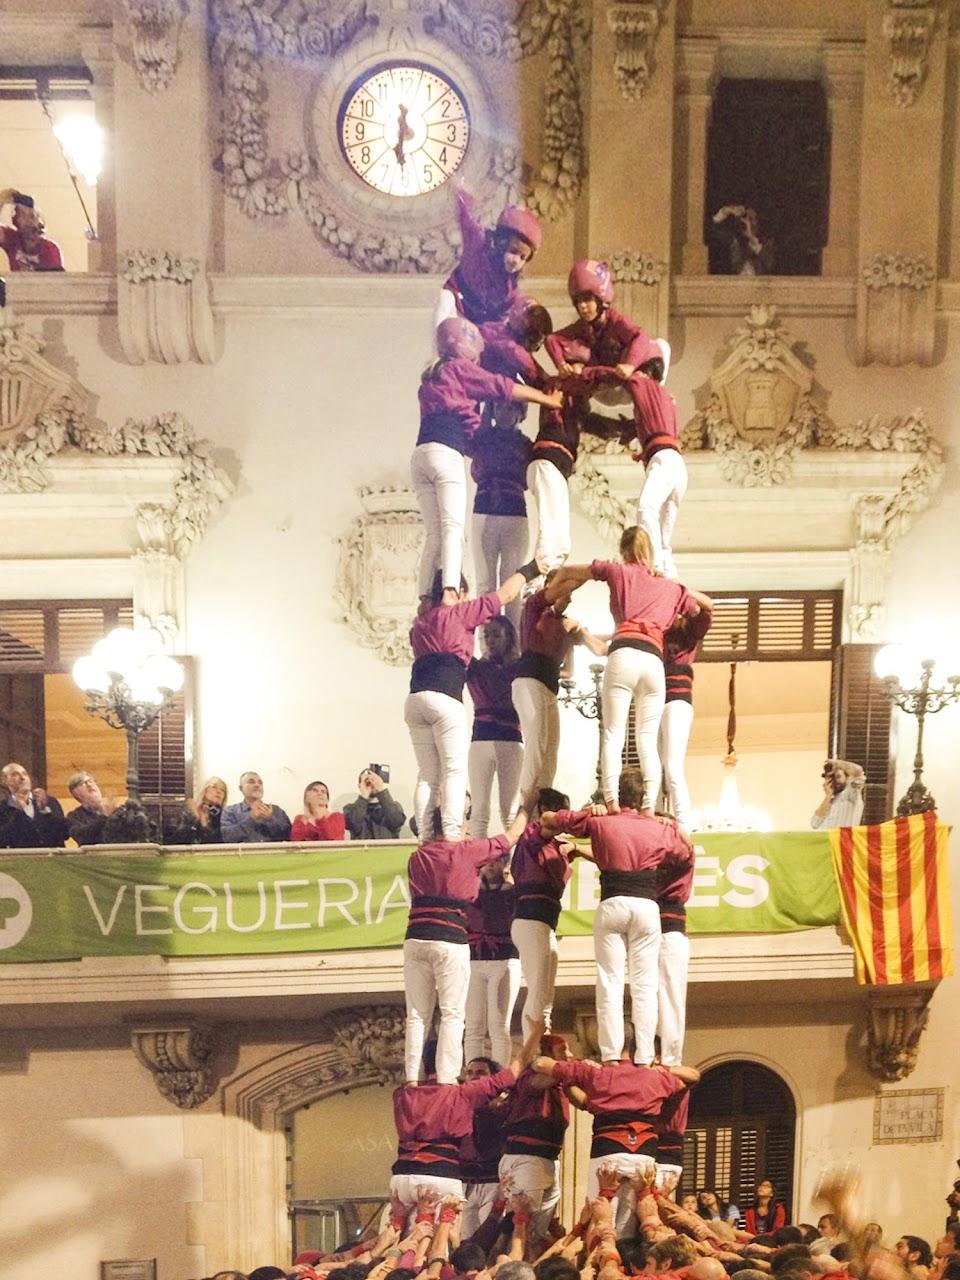 Diada del Roser (Vilafranca del Penedès) 31-10-2015 - 2015_10_31-Diada del Roser_Vilafranca del Pened%C3%A8s-93.jpg